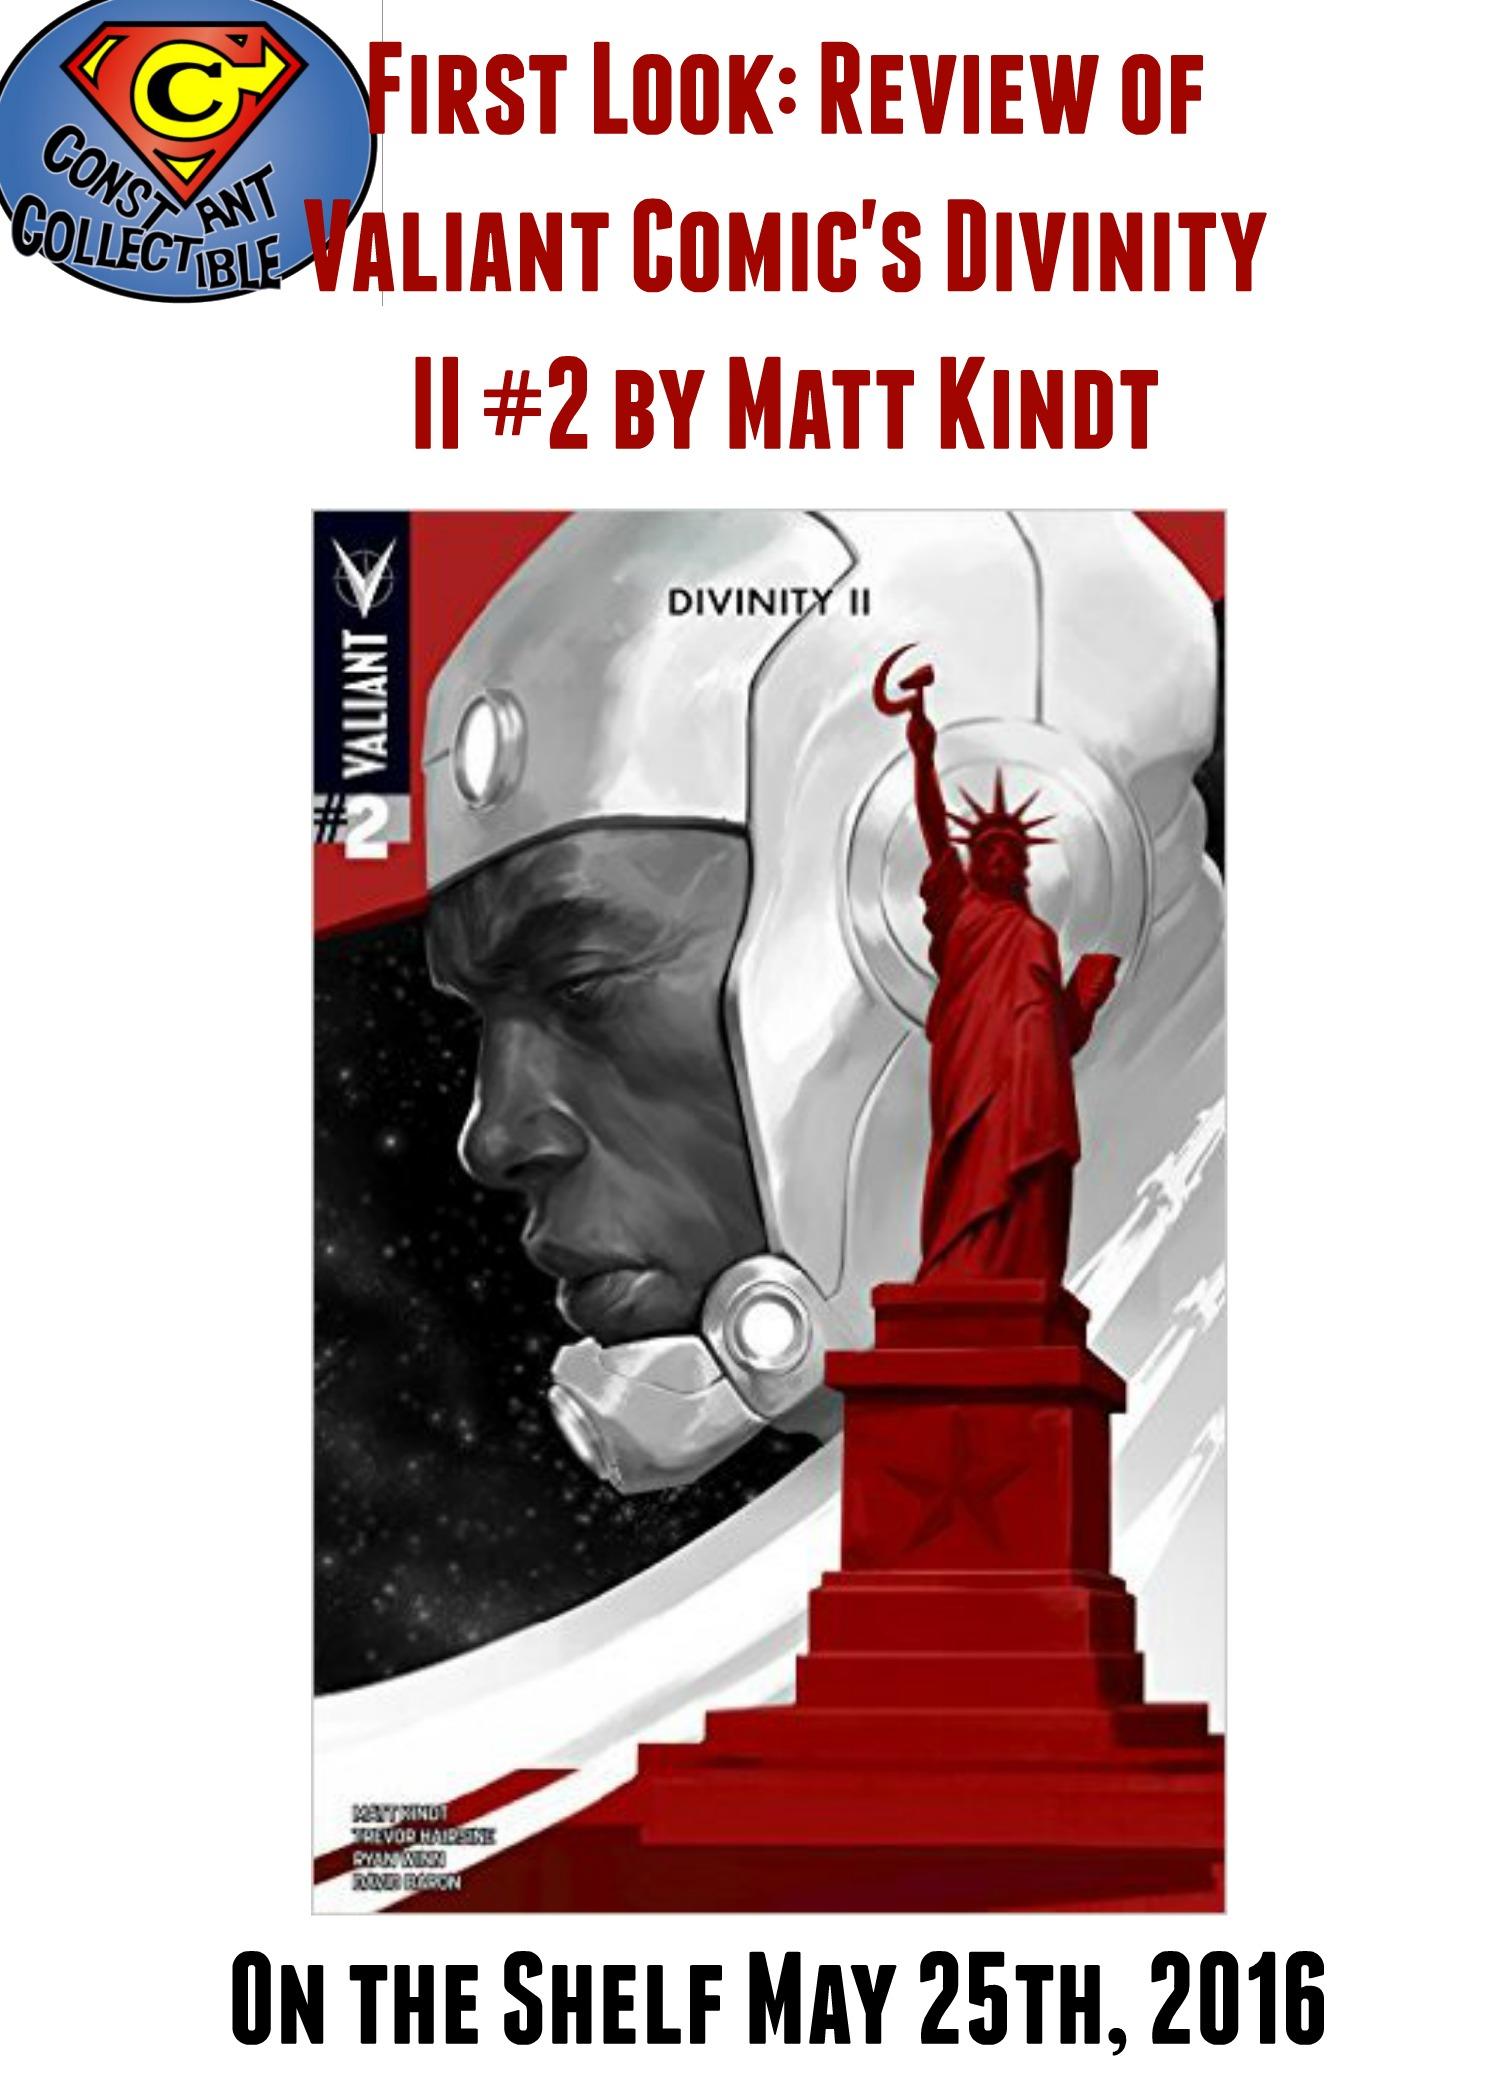 First Look Review of @ValiantComics Divinity II #2 by Matt Kindt